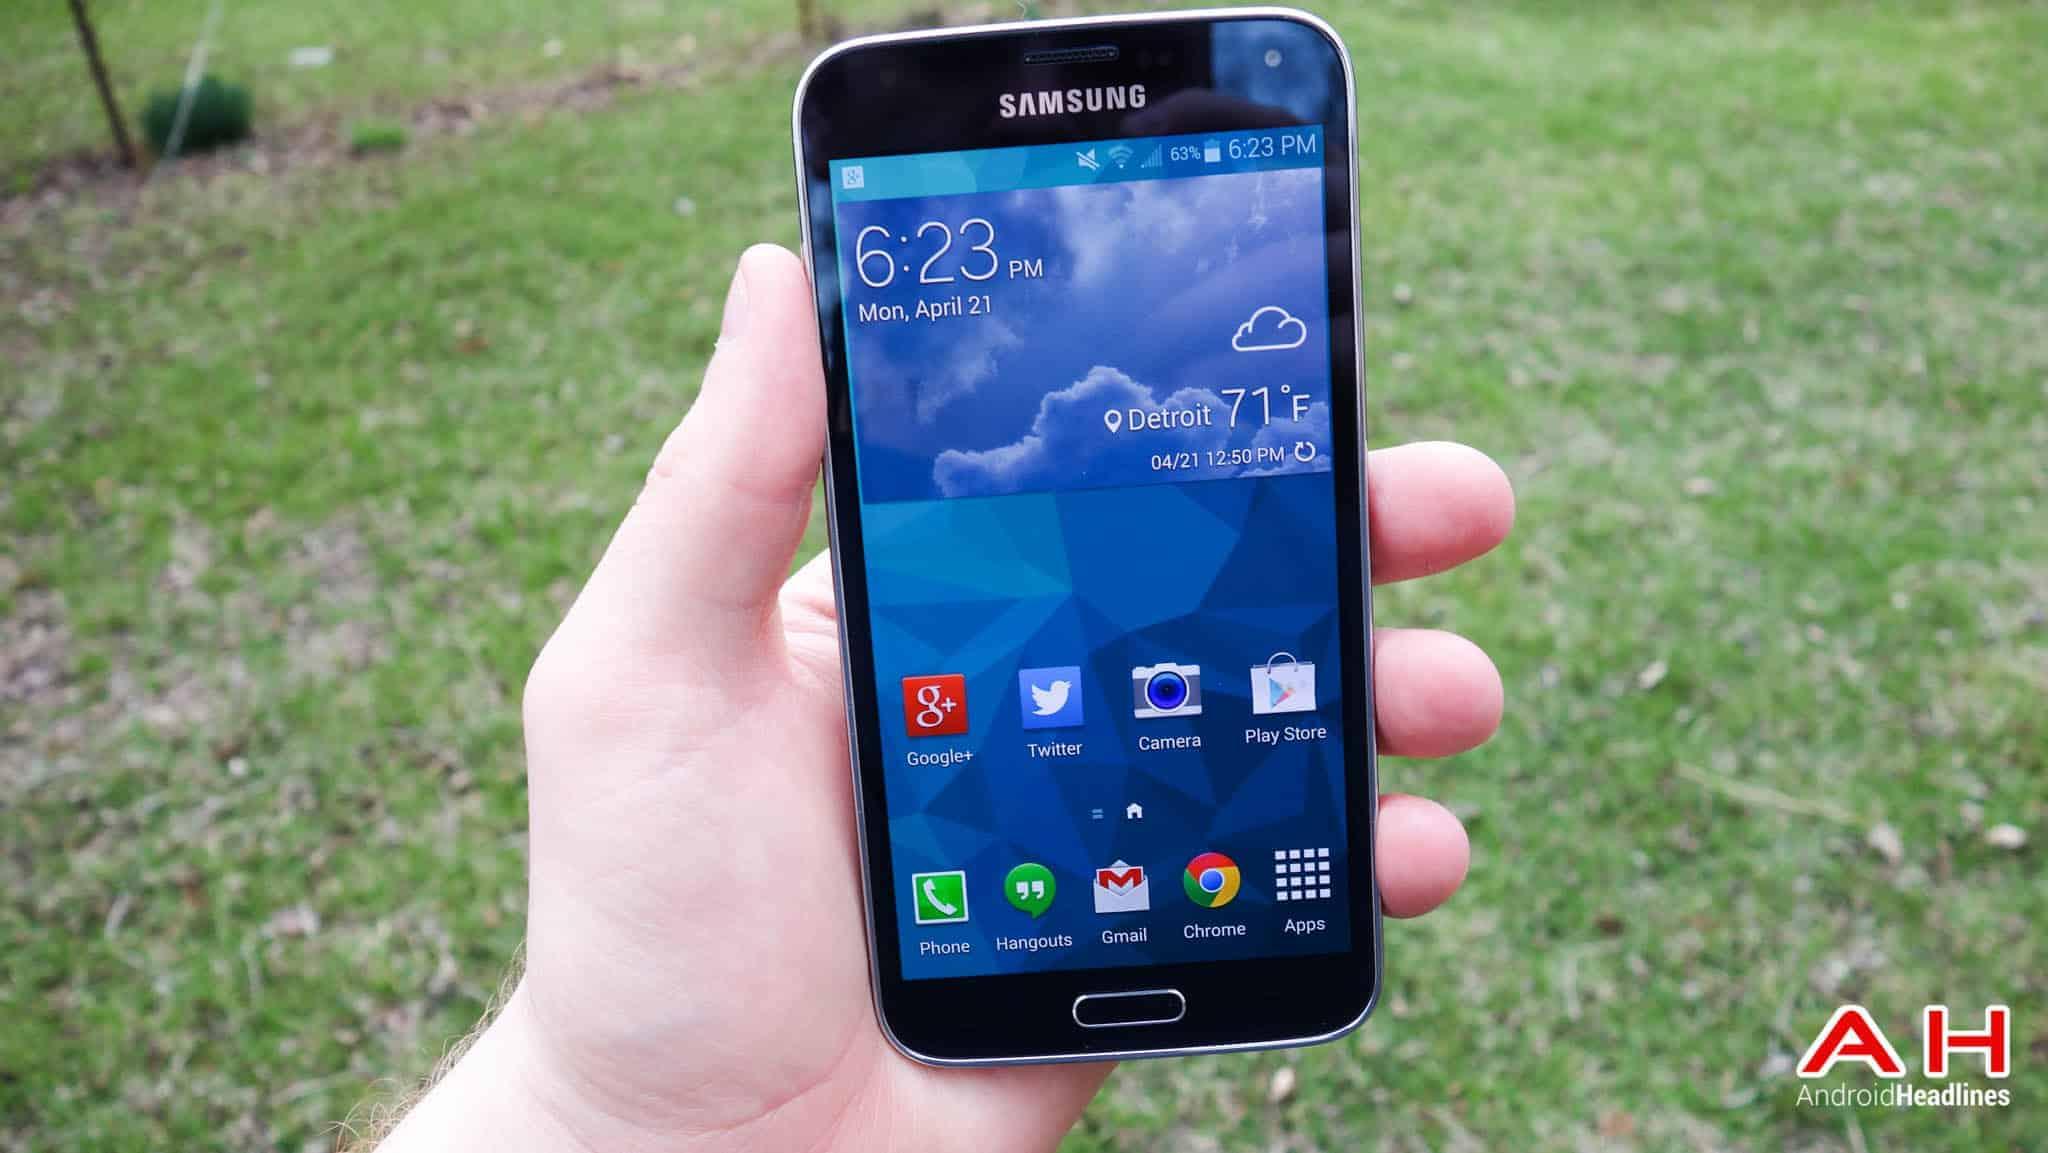 Samsung-galaxy-s5-ah-19